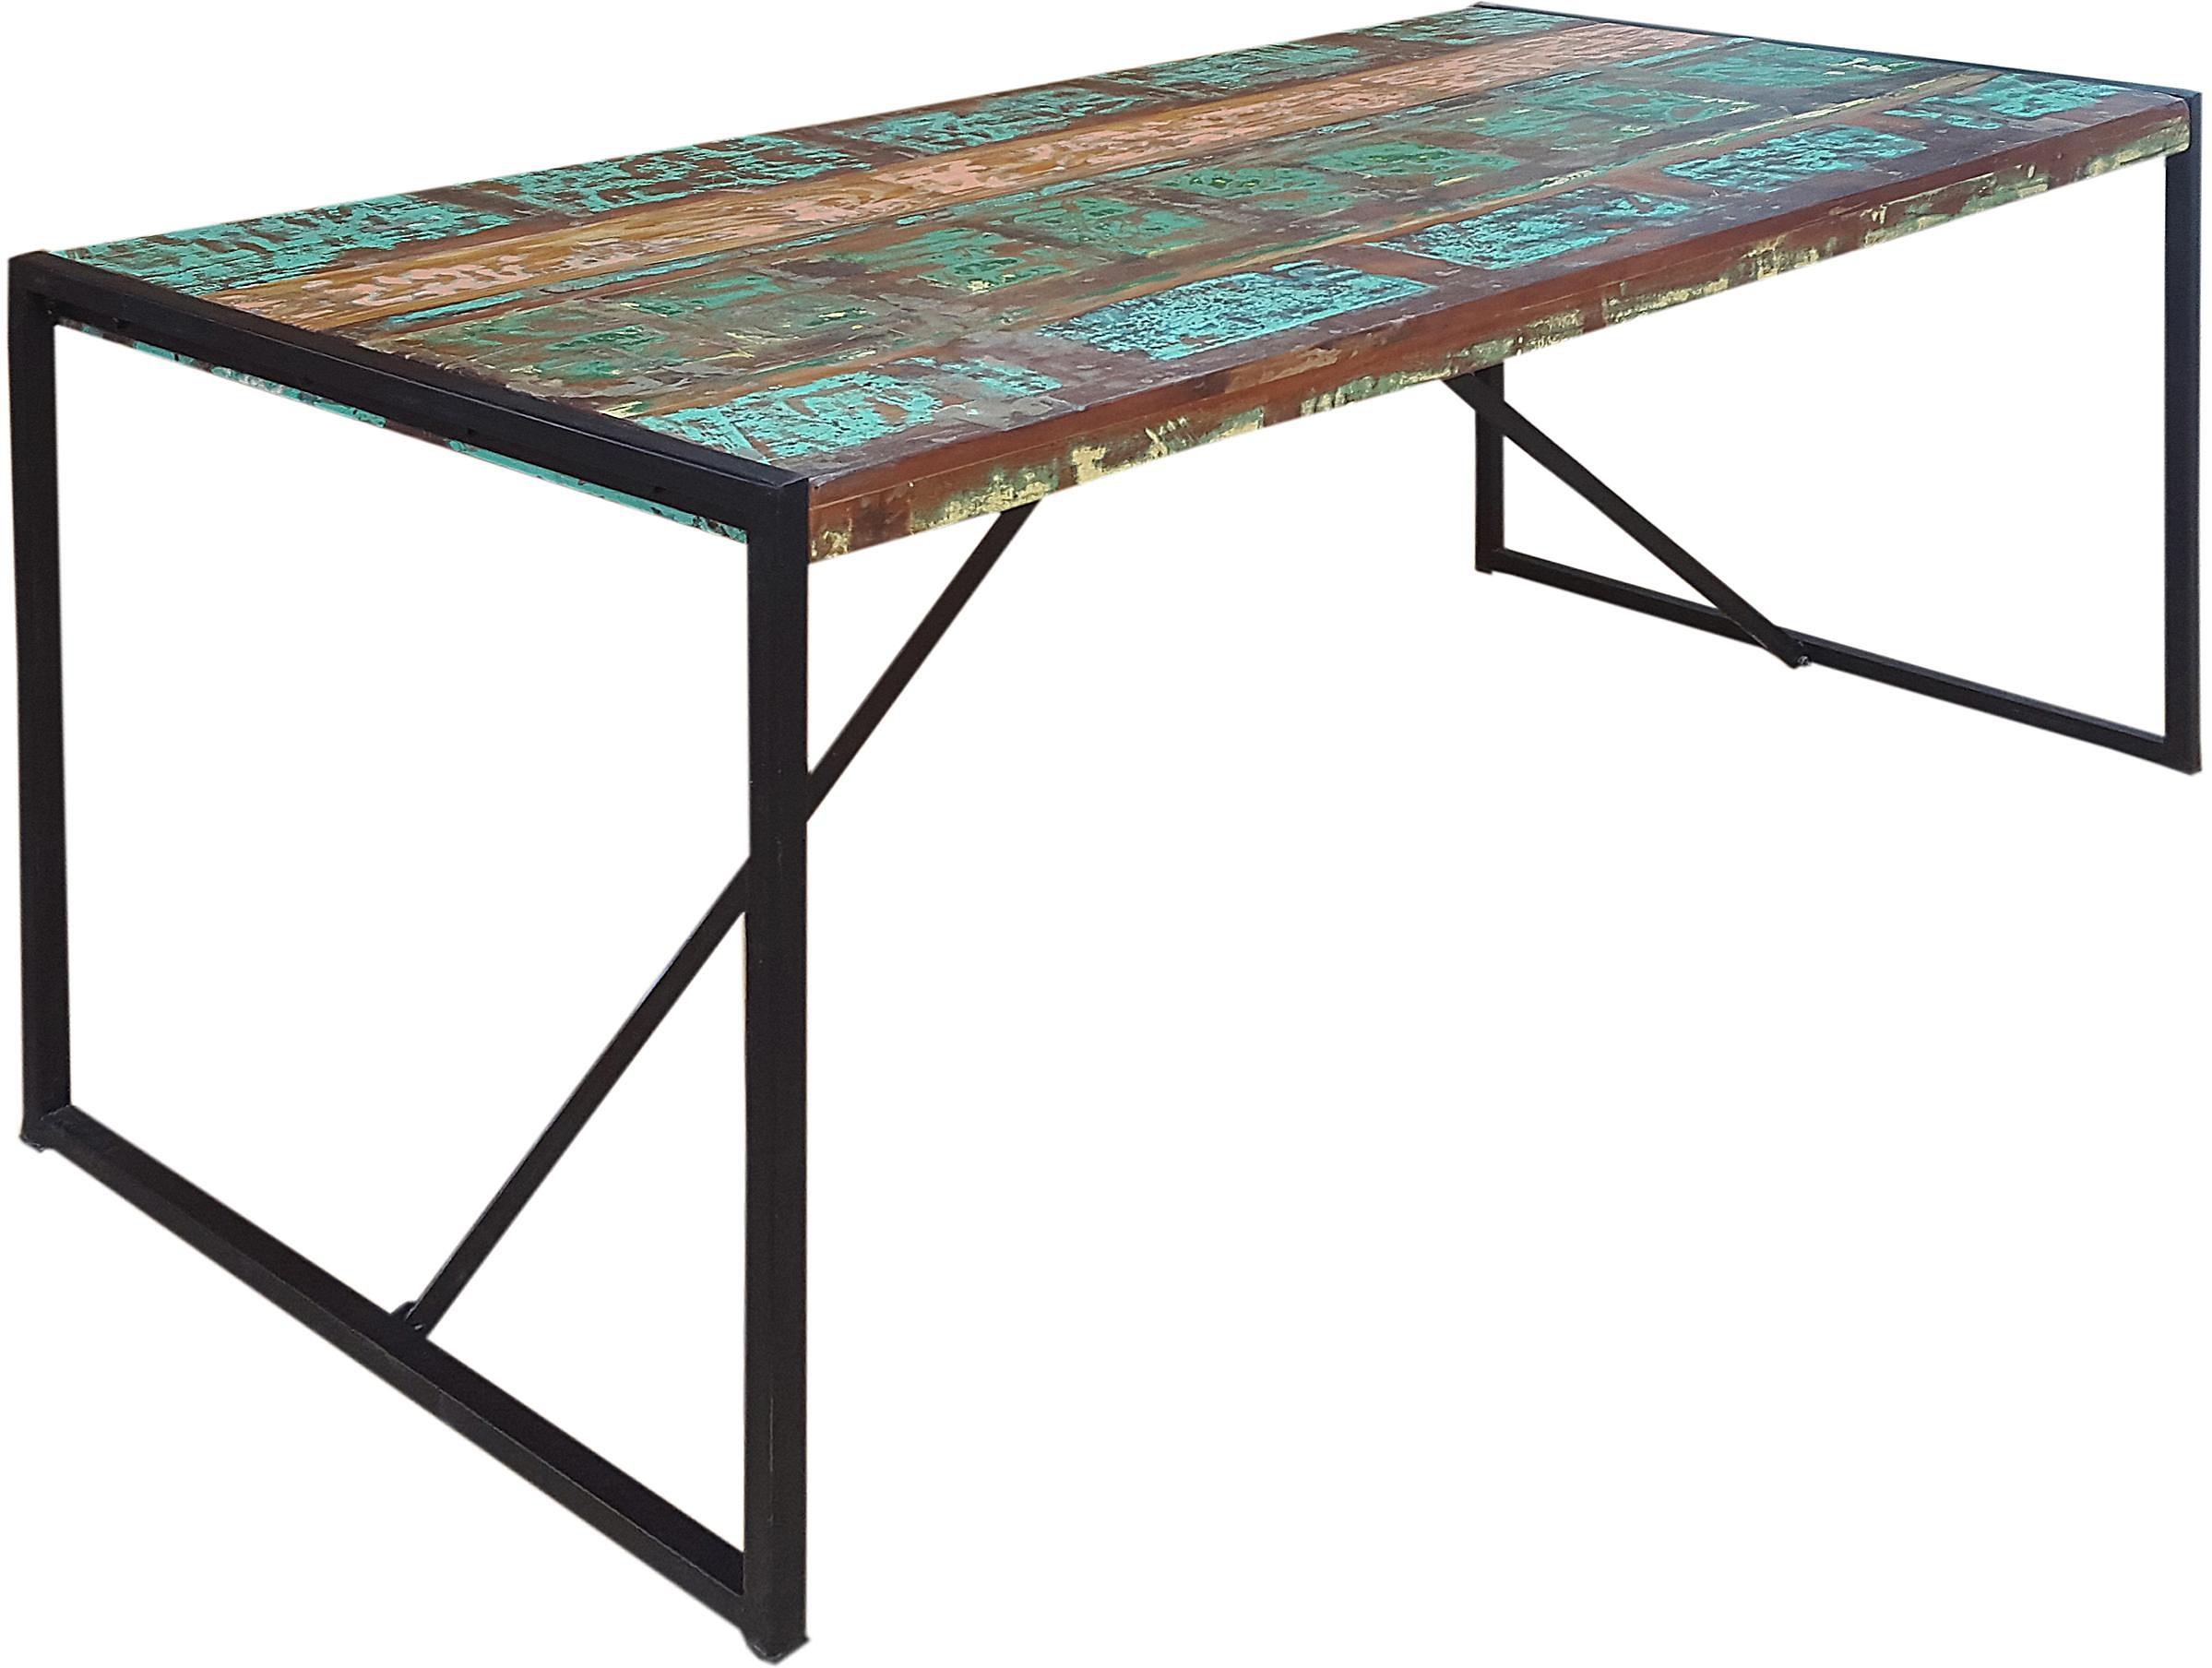 SIT Tisch »Bali«, aus recyltem Altholz